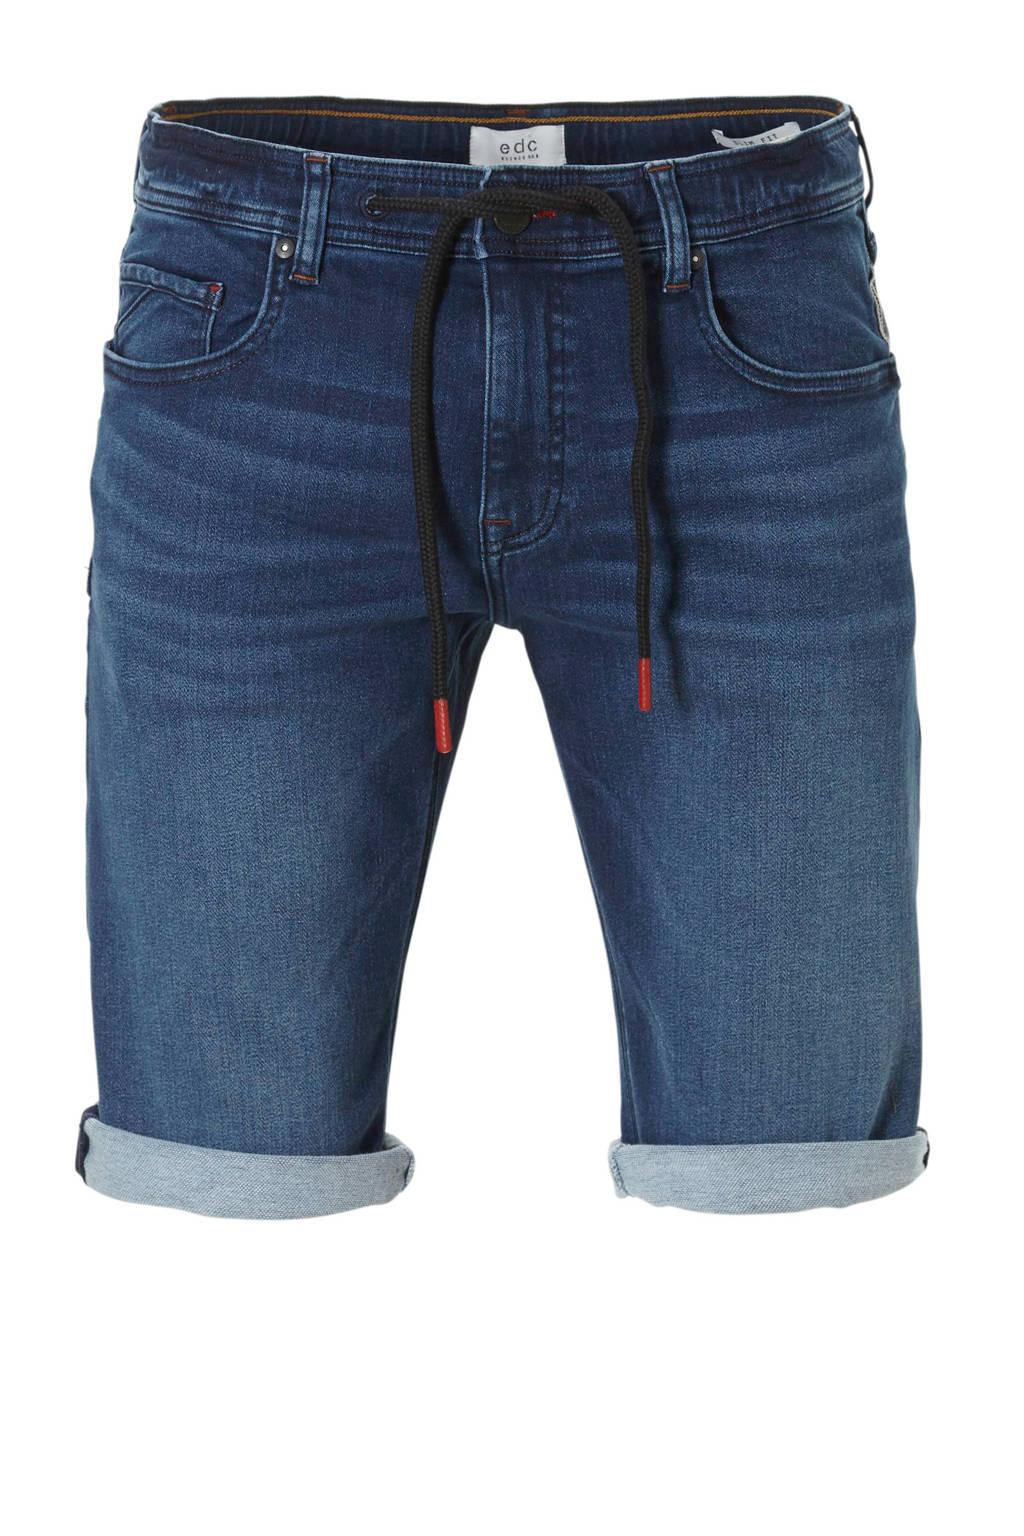 edc Men slim fit jeans short, Dark denim